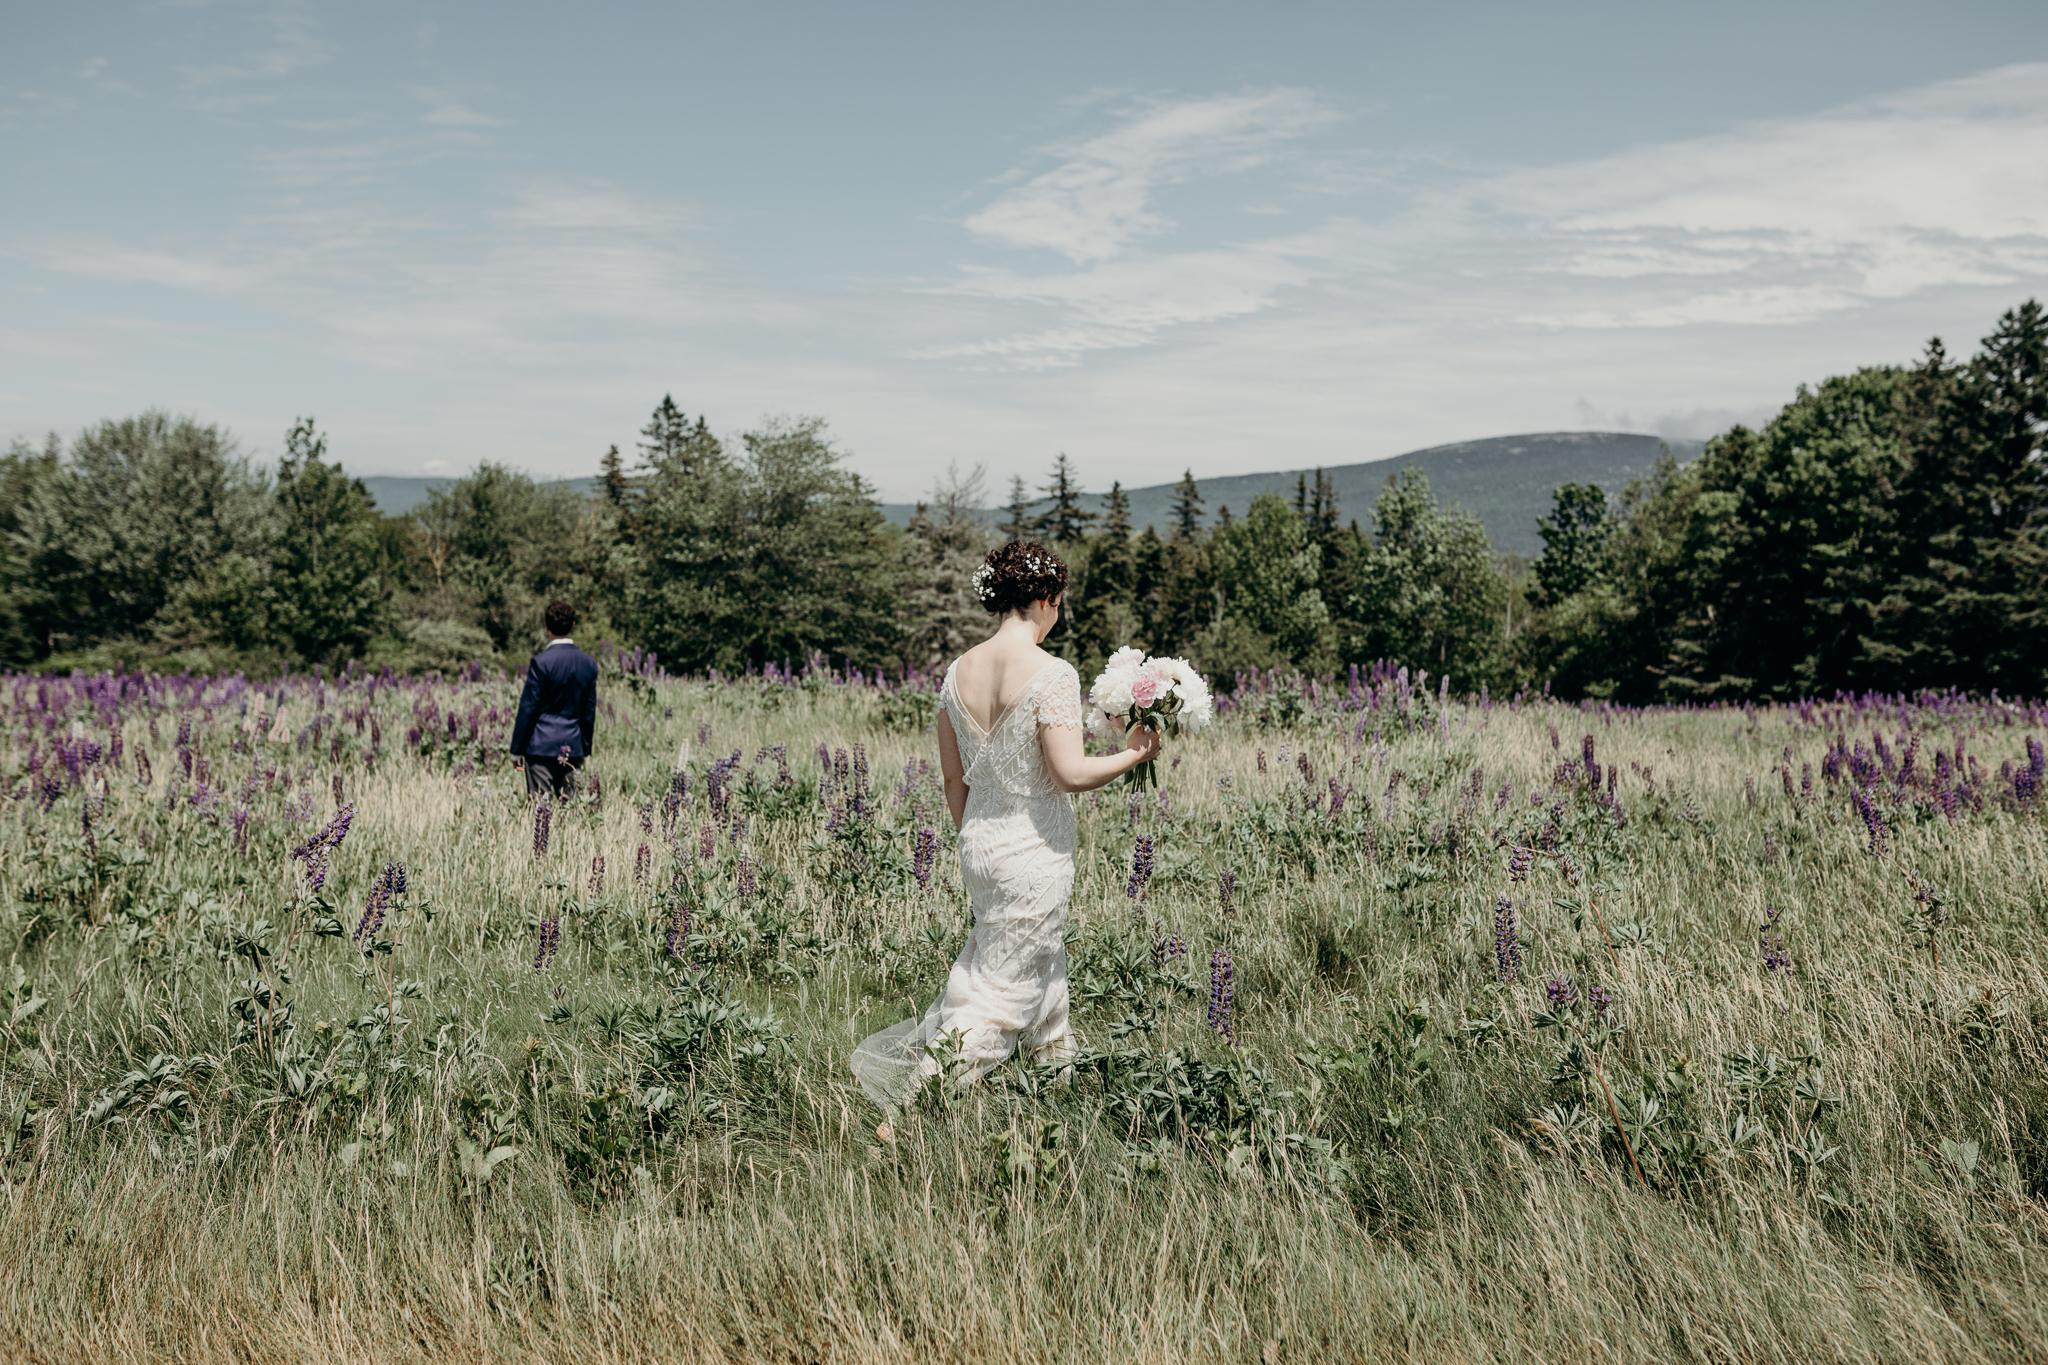 erinwheatco-8967 Maine Wedding by the Sea | Ruth & Ryan